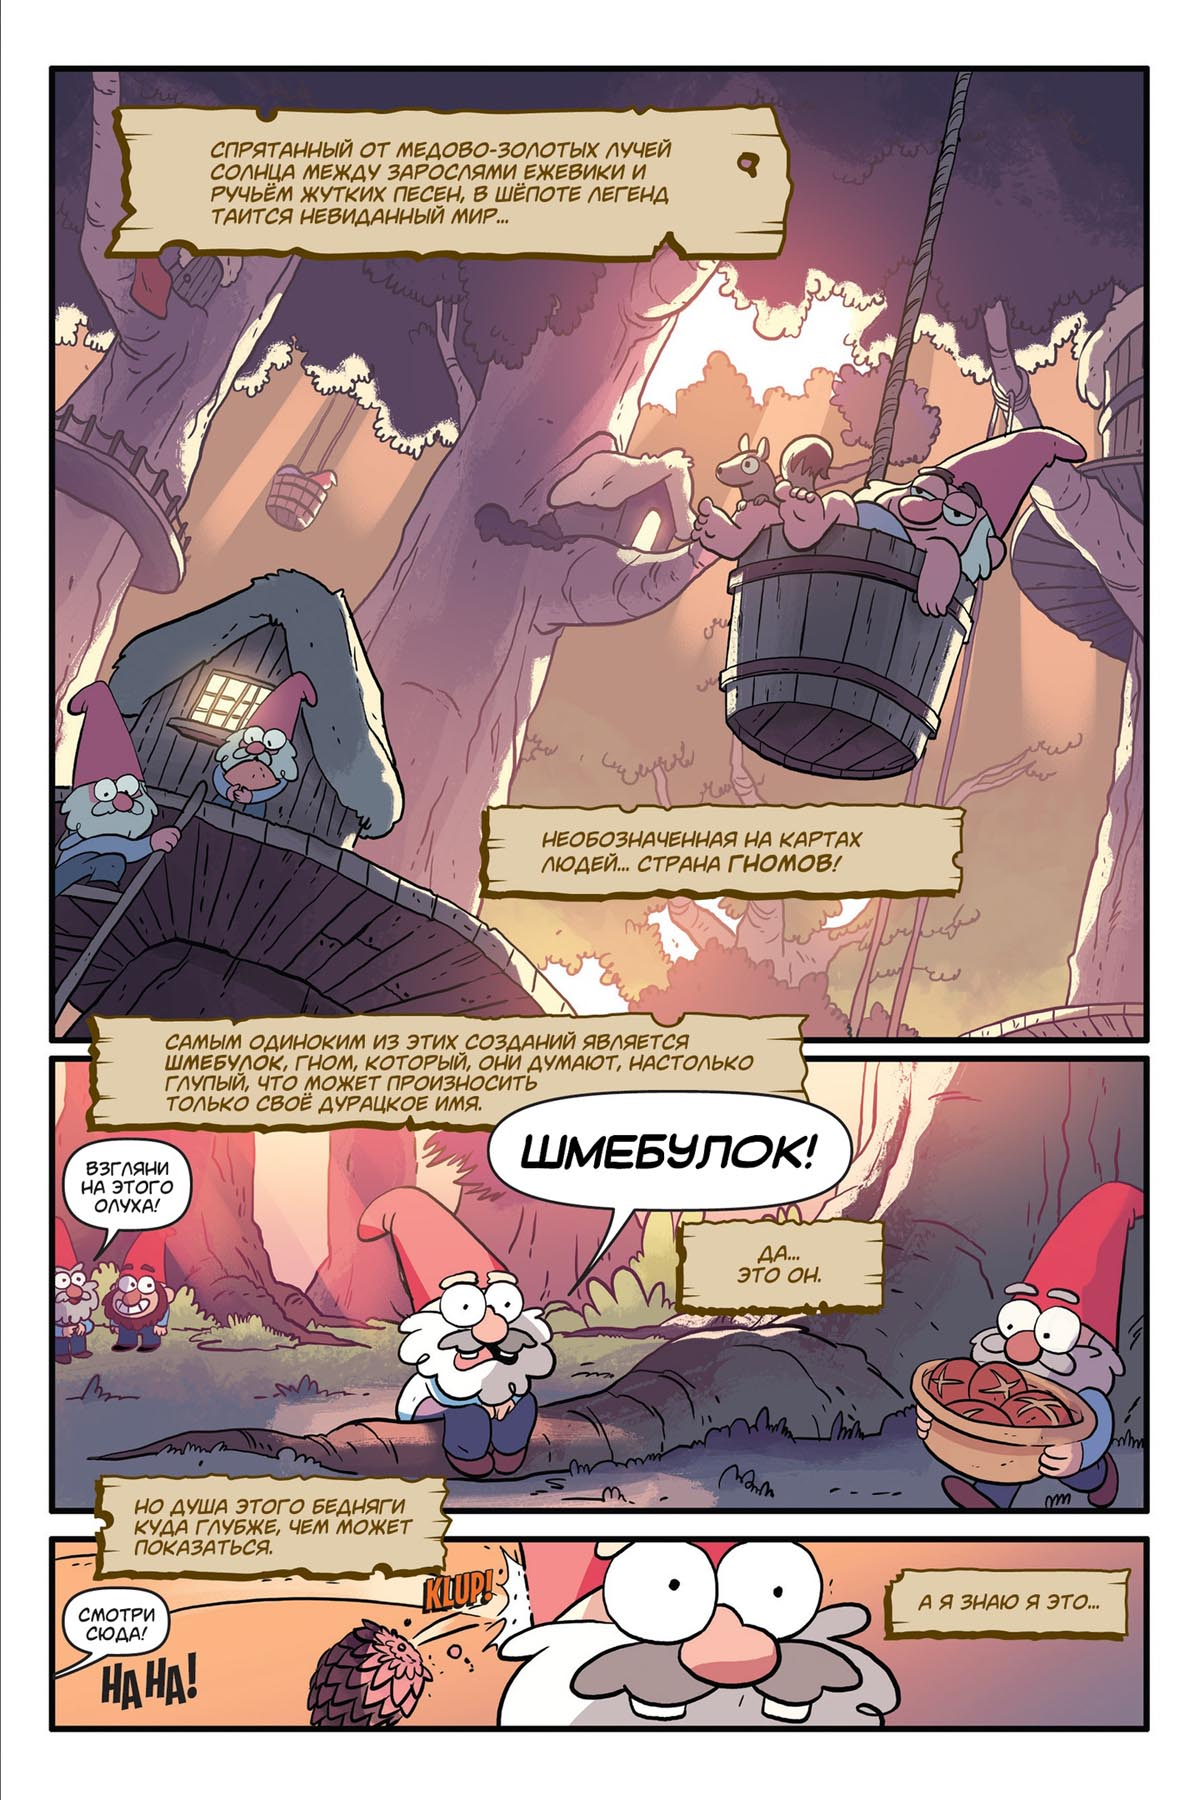 Комикс Гравити Фолз Утерянные Легенды 1-5